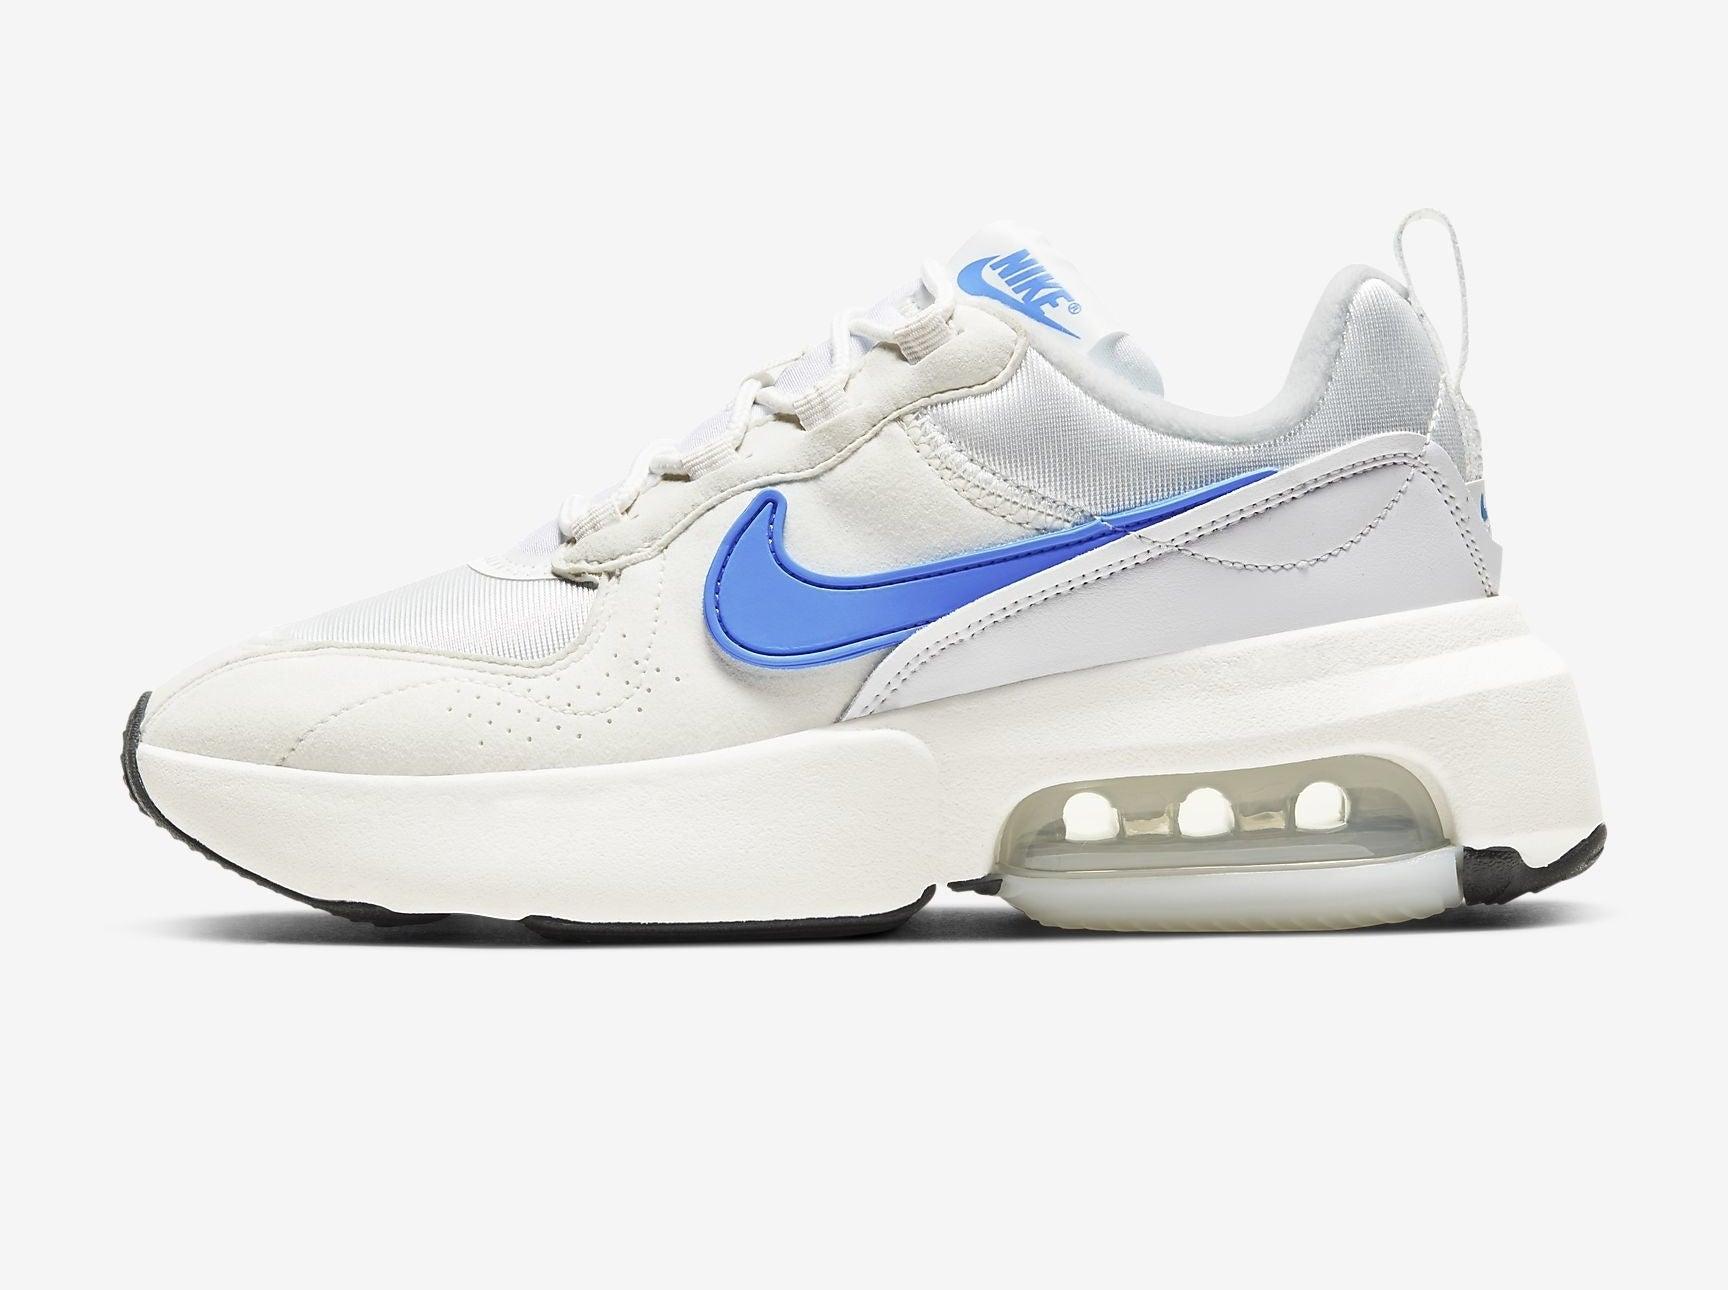 White and blue Nike Air Max Verona sneaker